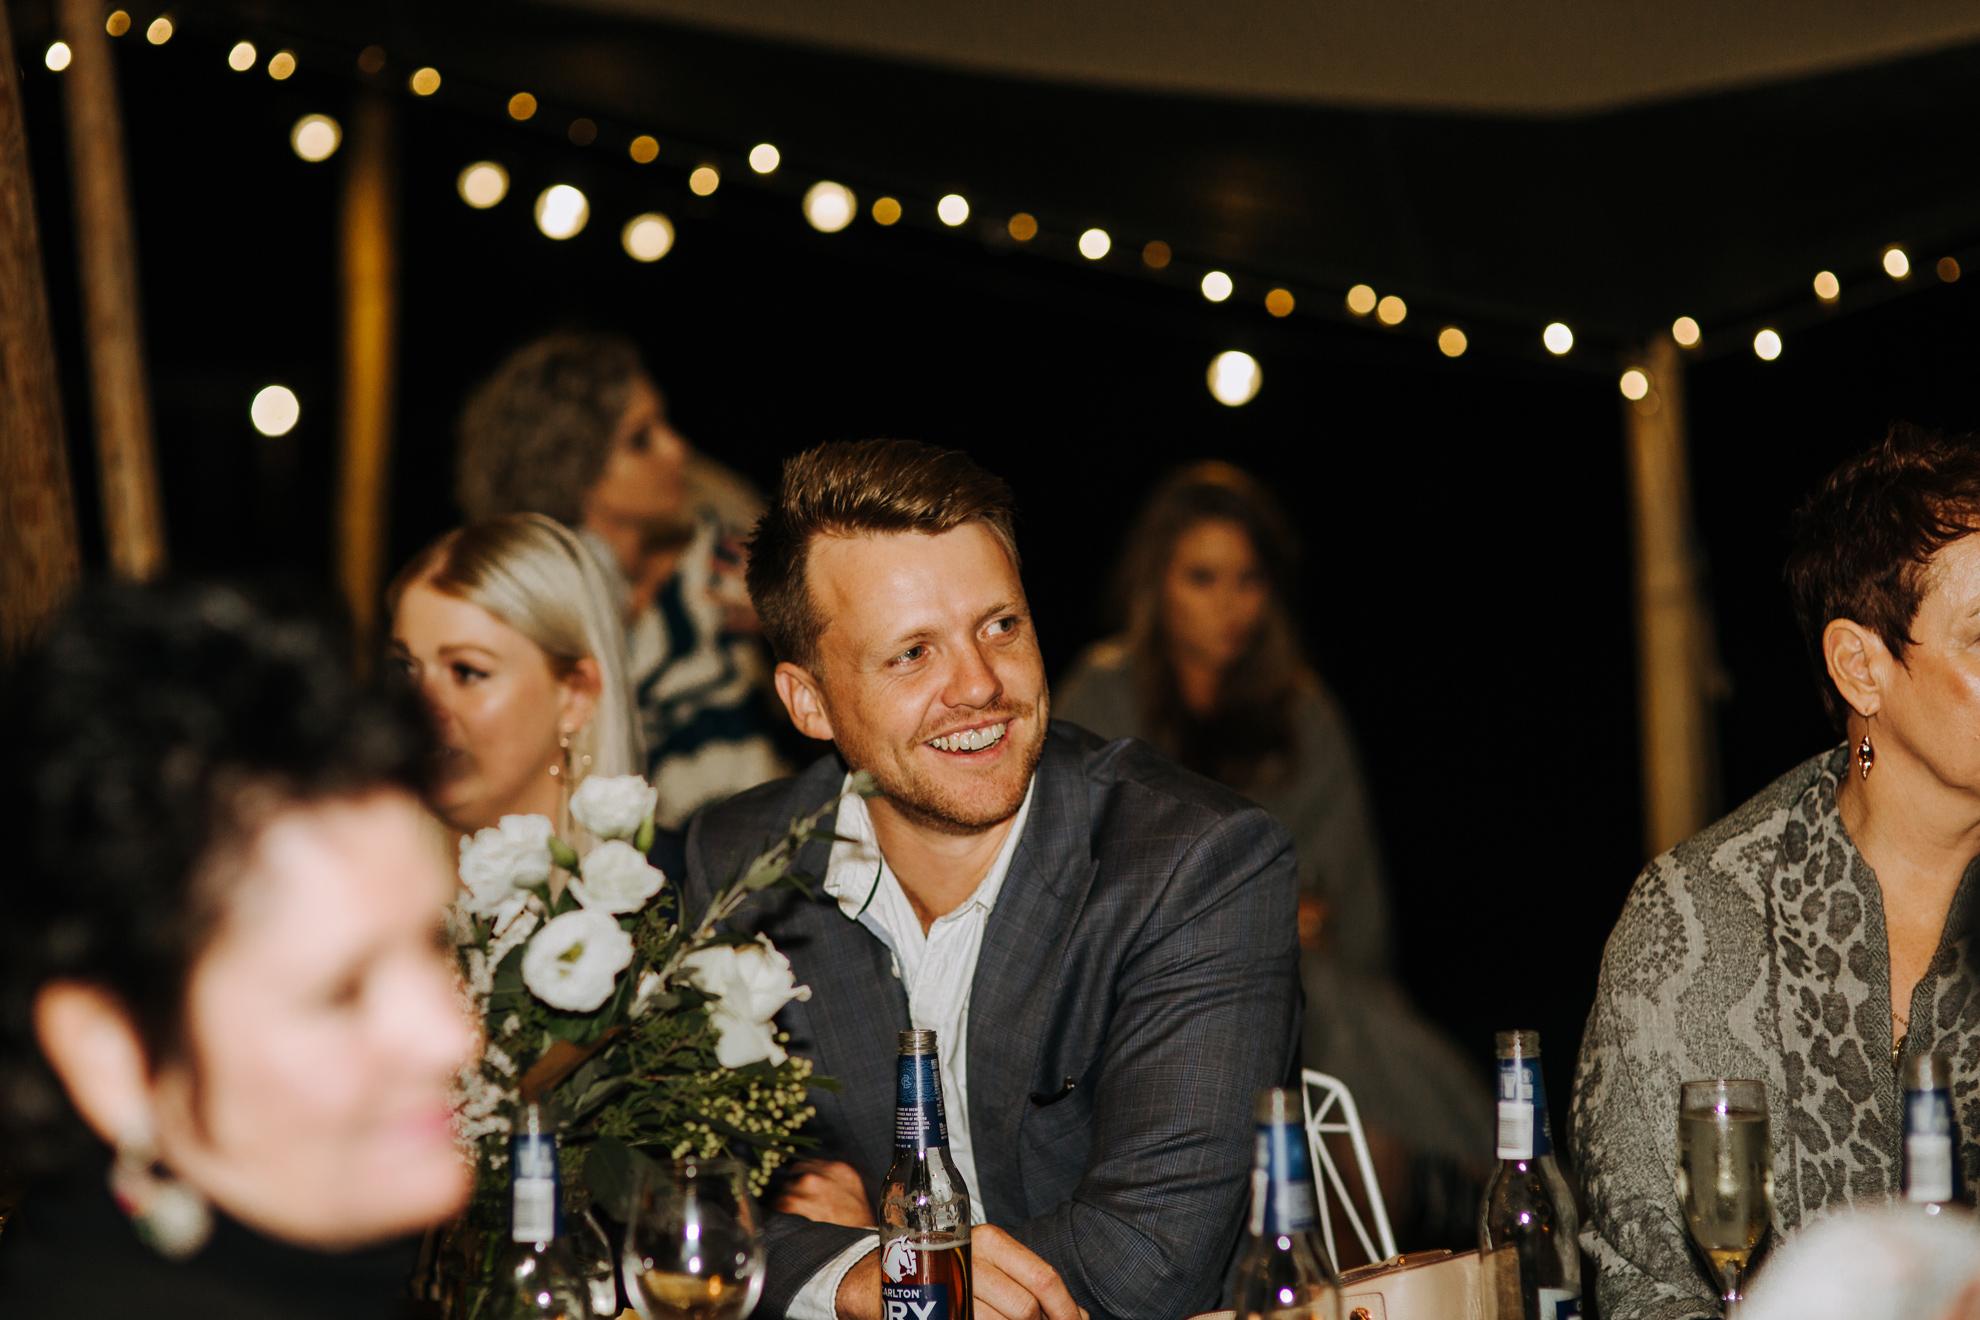 095-Kirby_Lewis_Maleny_Manor_Wedding.jpg